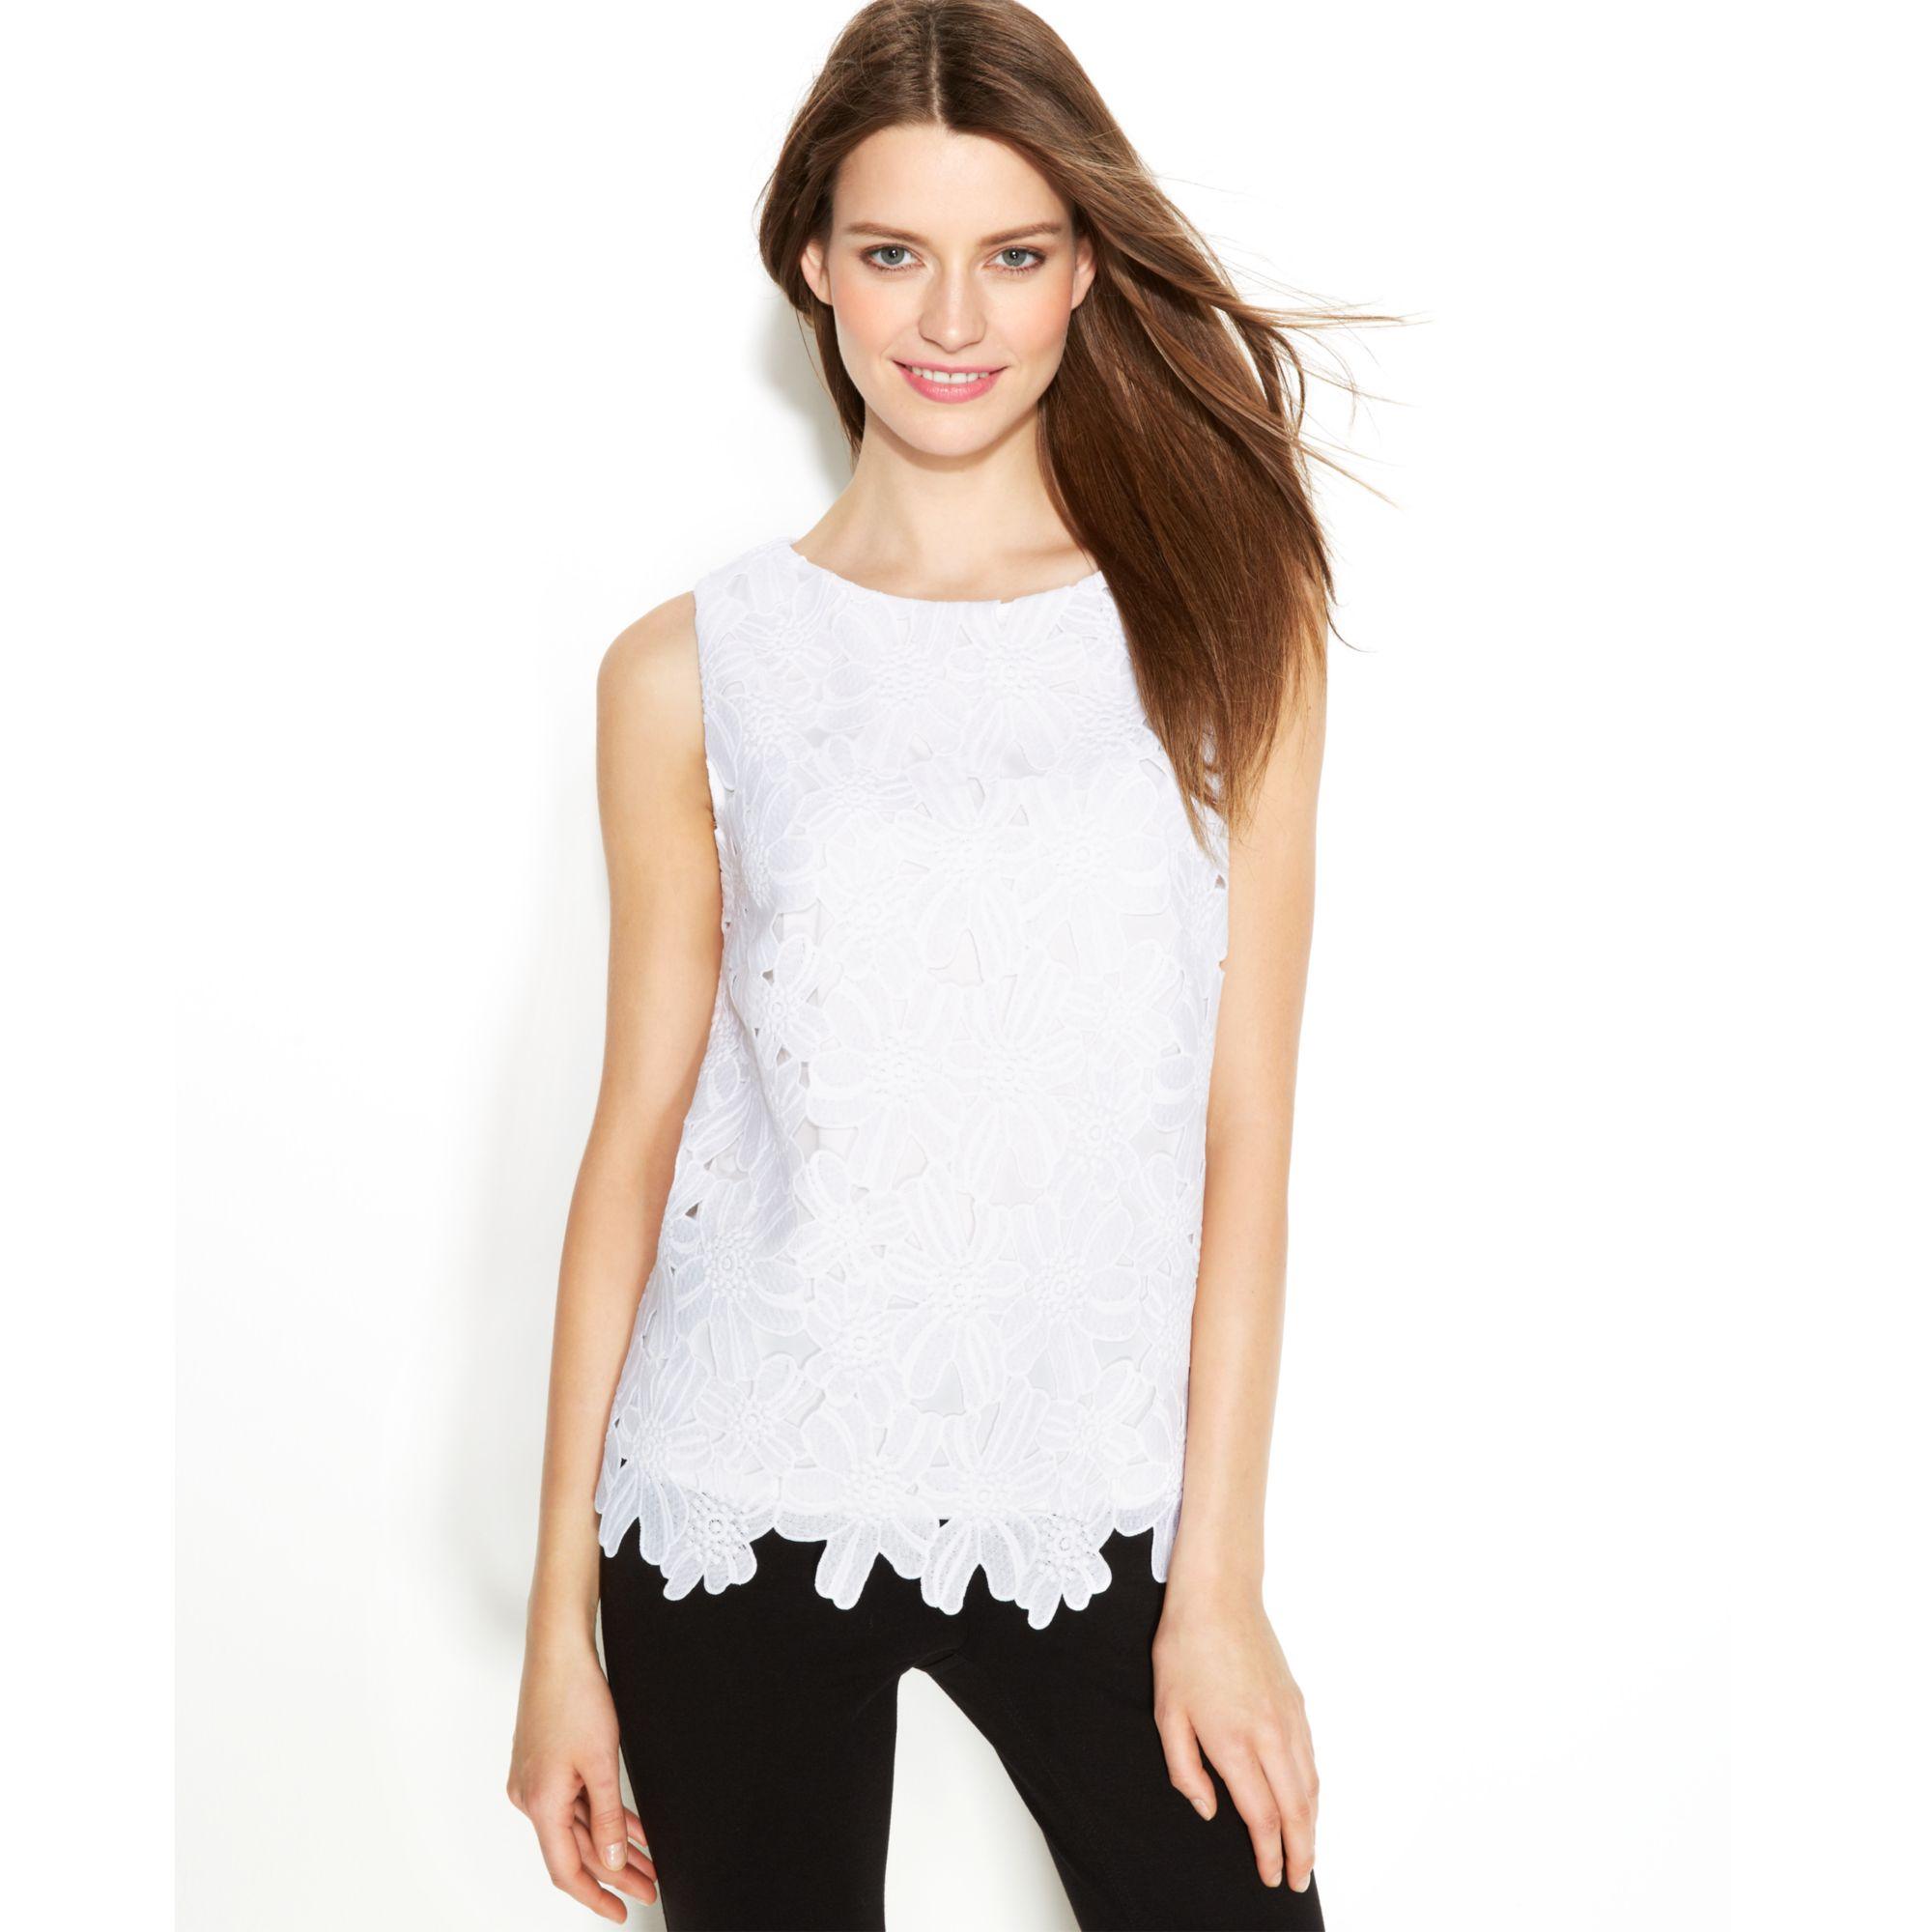 48e8fbc196e90 Lyst - Calvin Klein Sleeveless Floral Lace Top in White